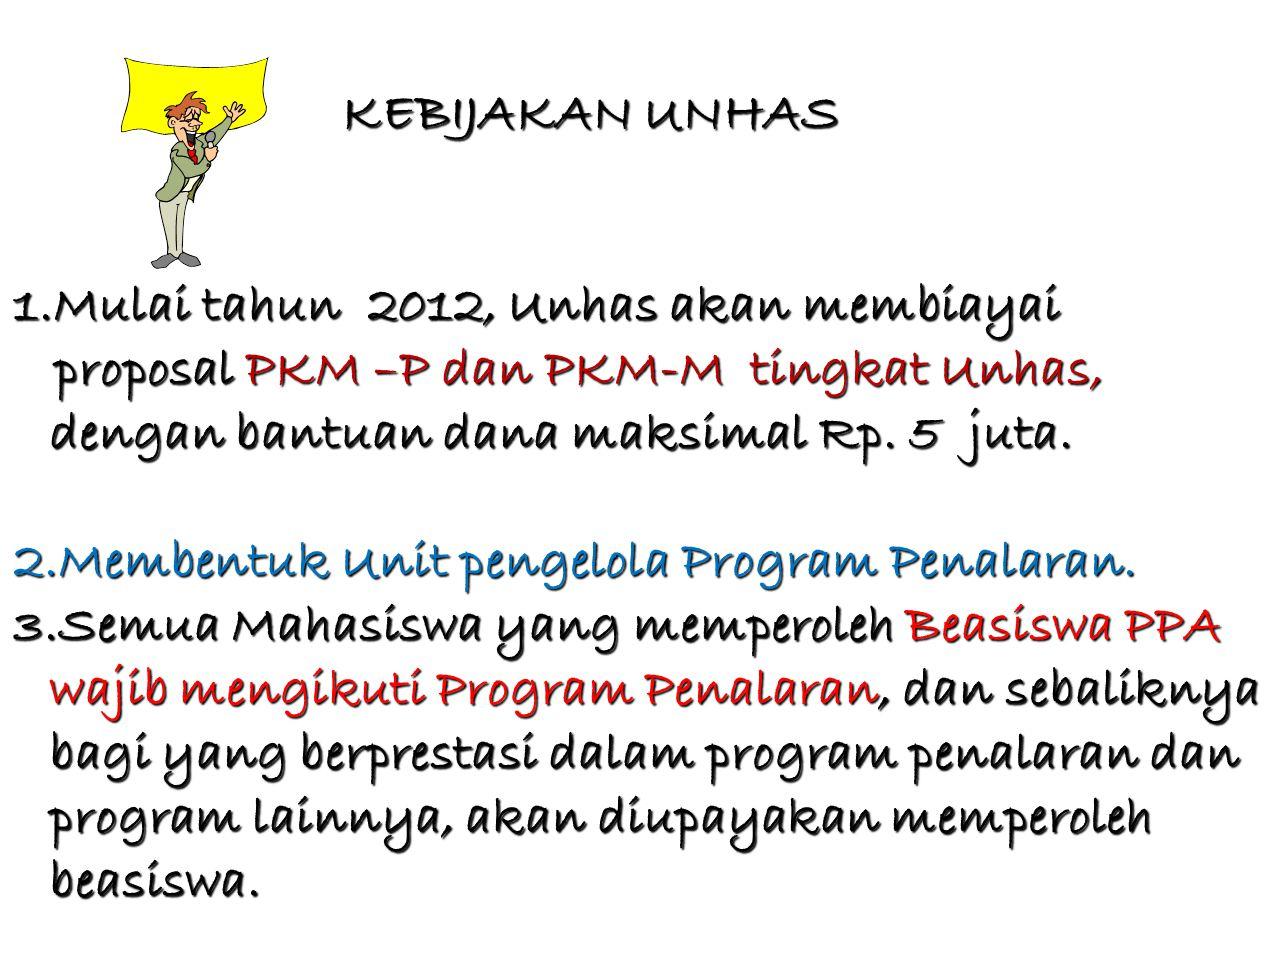 KEBIJAKAN UNHAS Mulai tahun 2012, Unhas akan membiayai. proposal PKM –P dan PKM-M tingkat Unhas, dengan bantuan dana maksimal Rp. 5 juta.